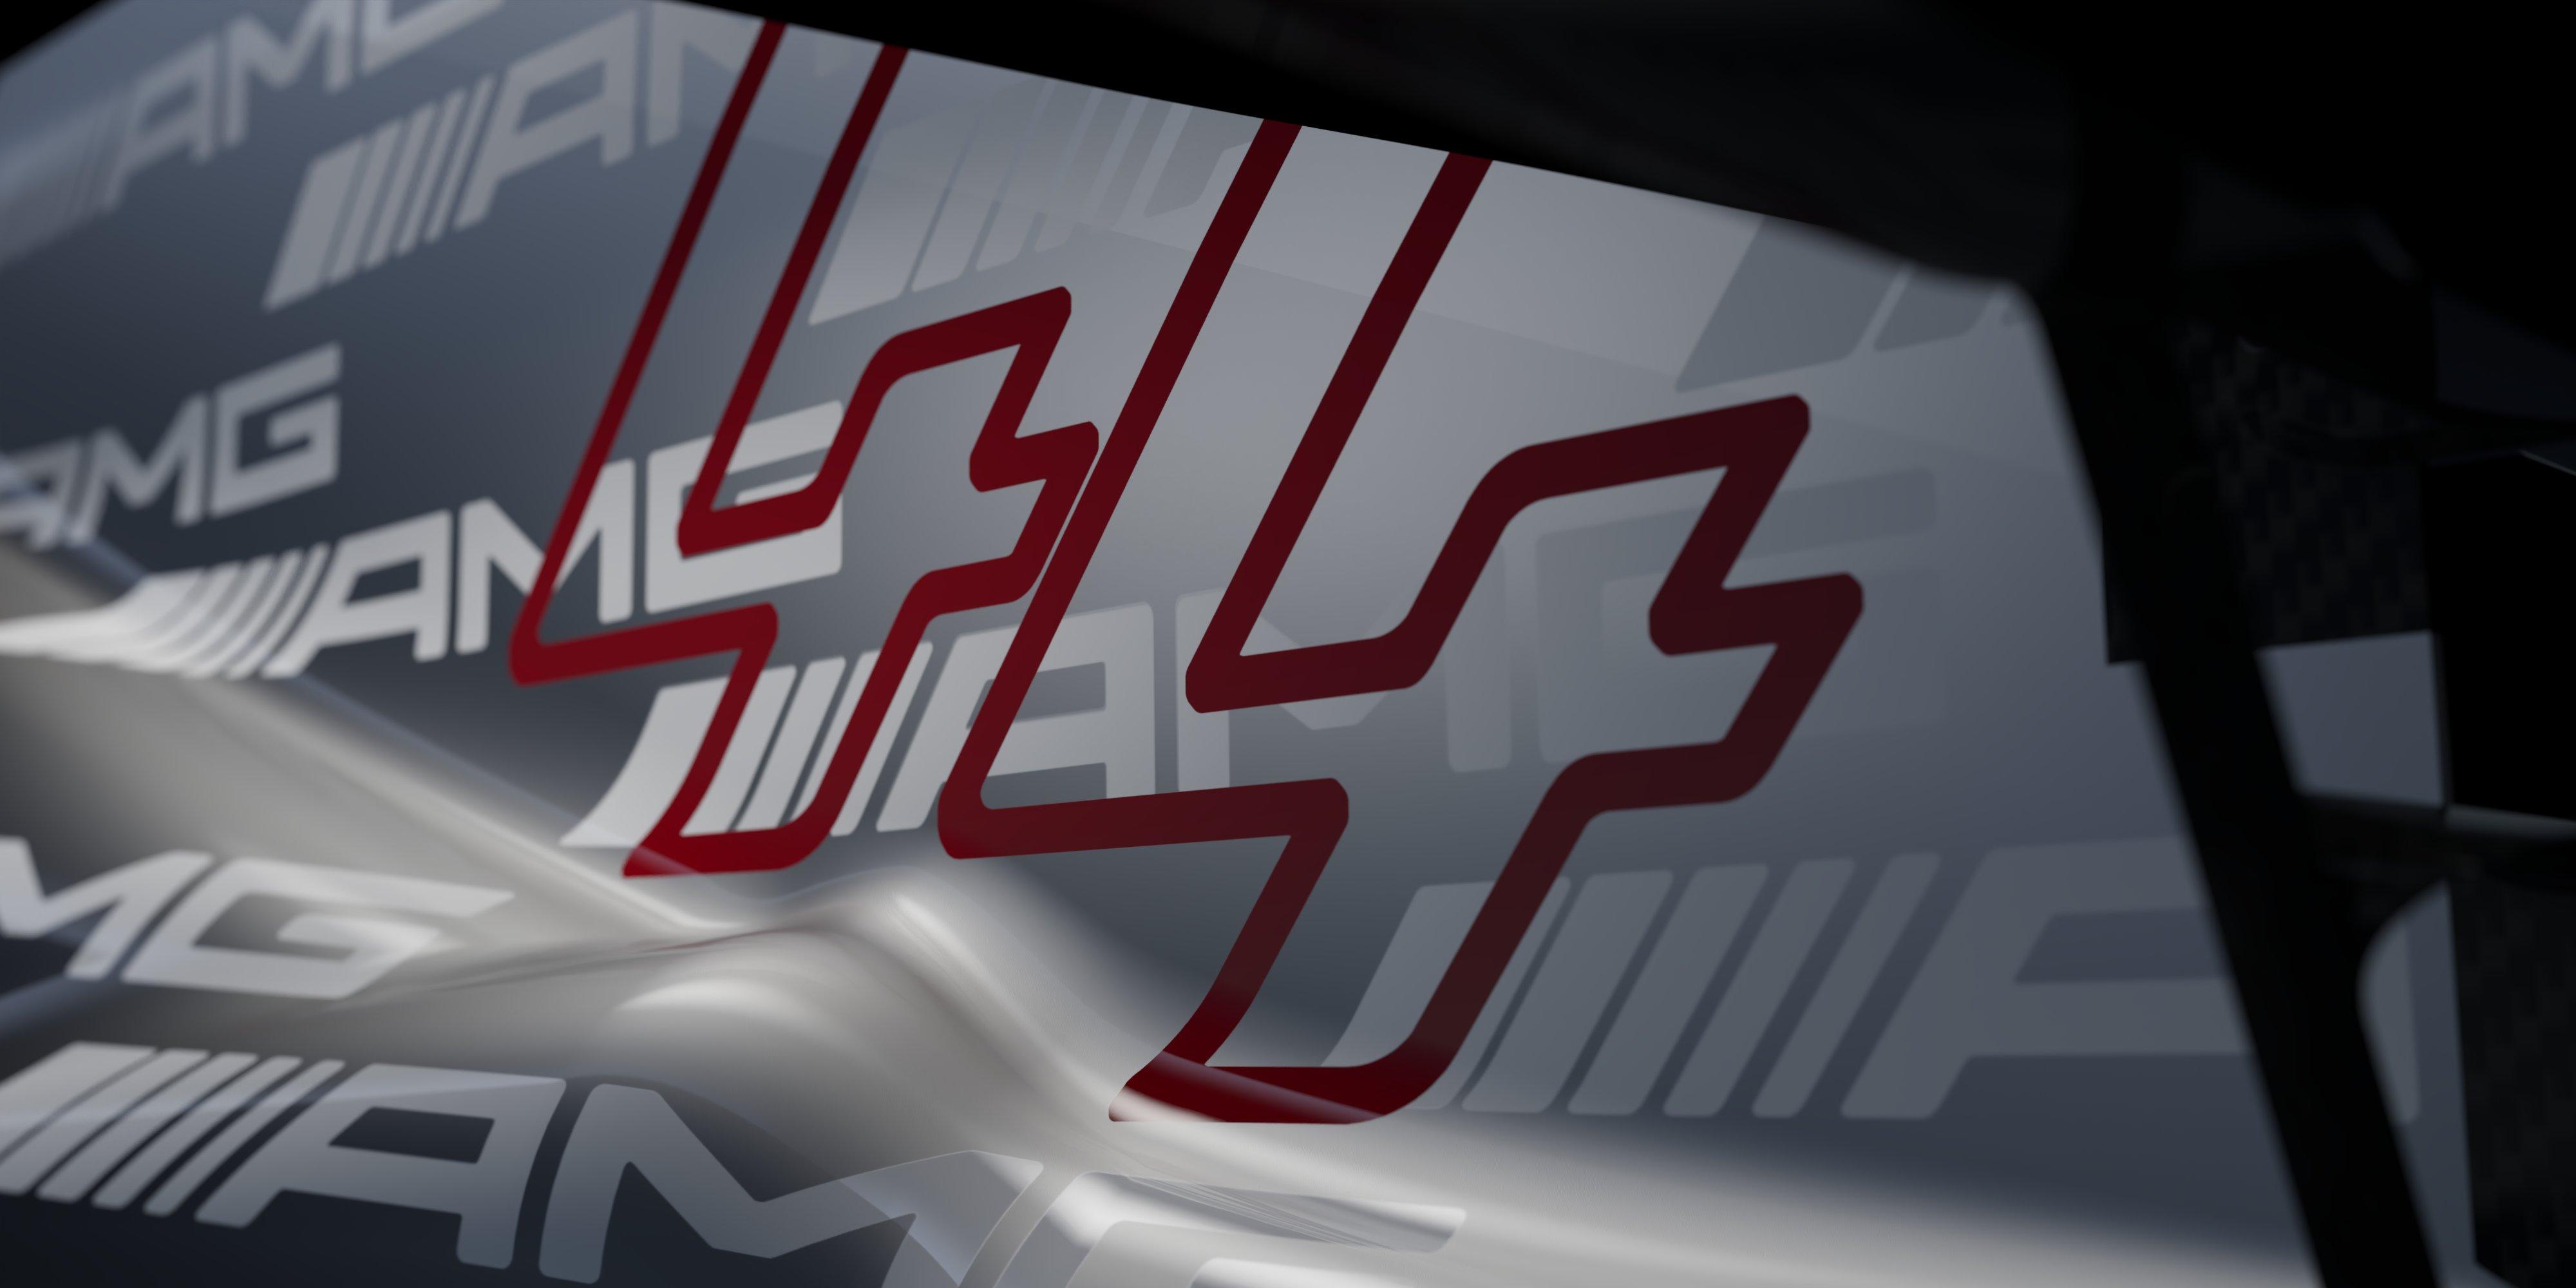 Pokrywa silnika Mercedesa W12